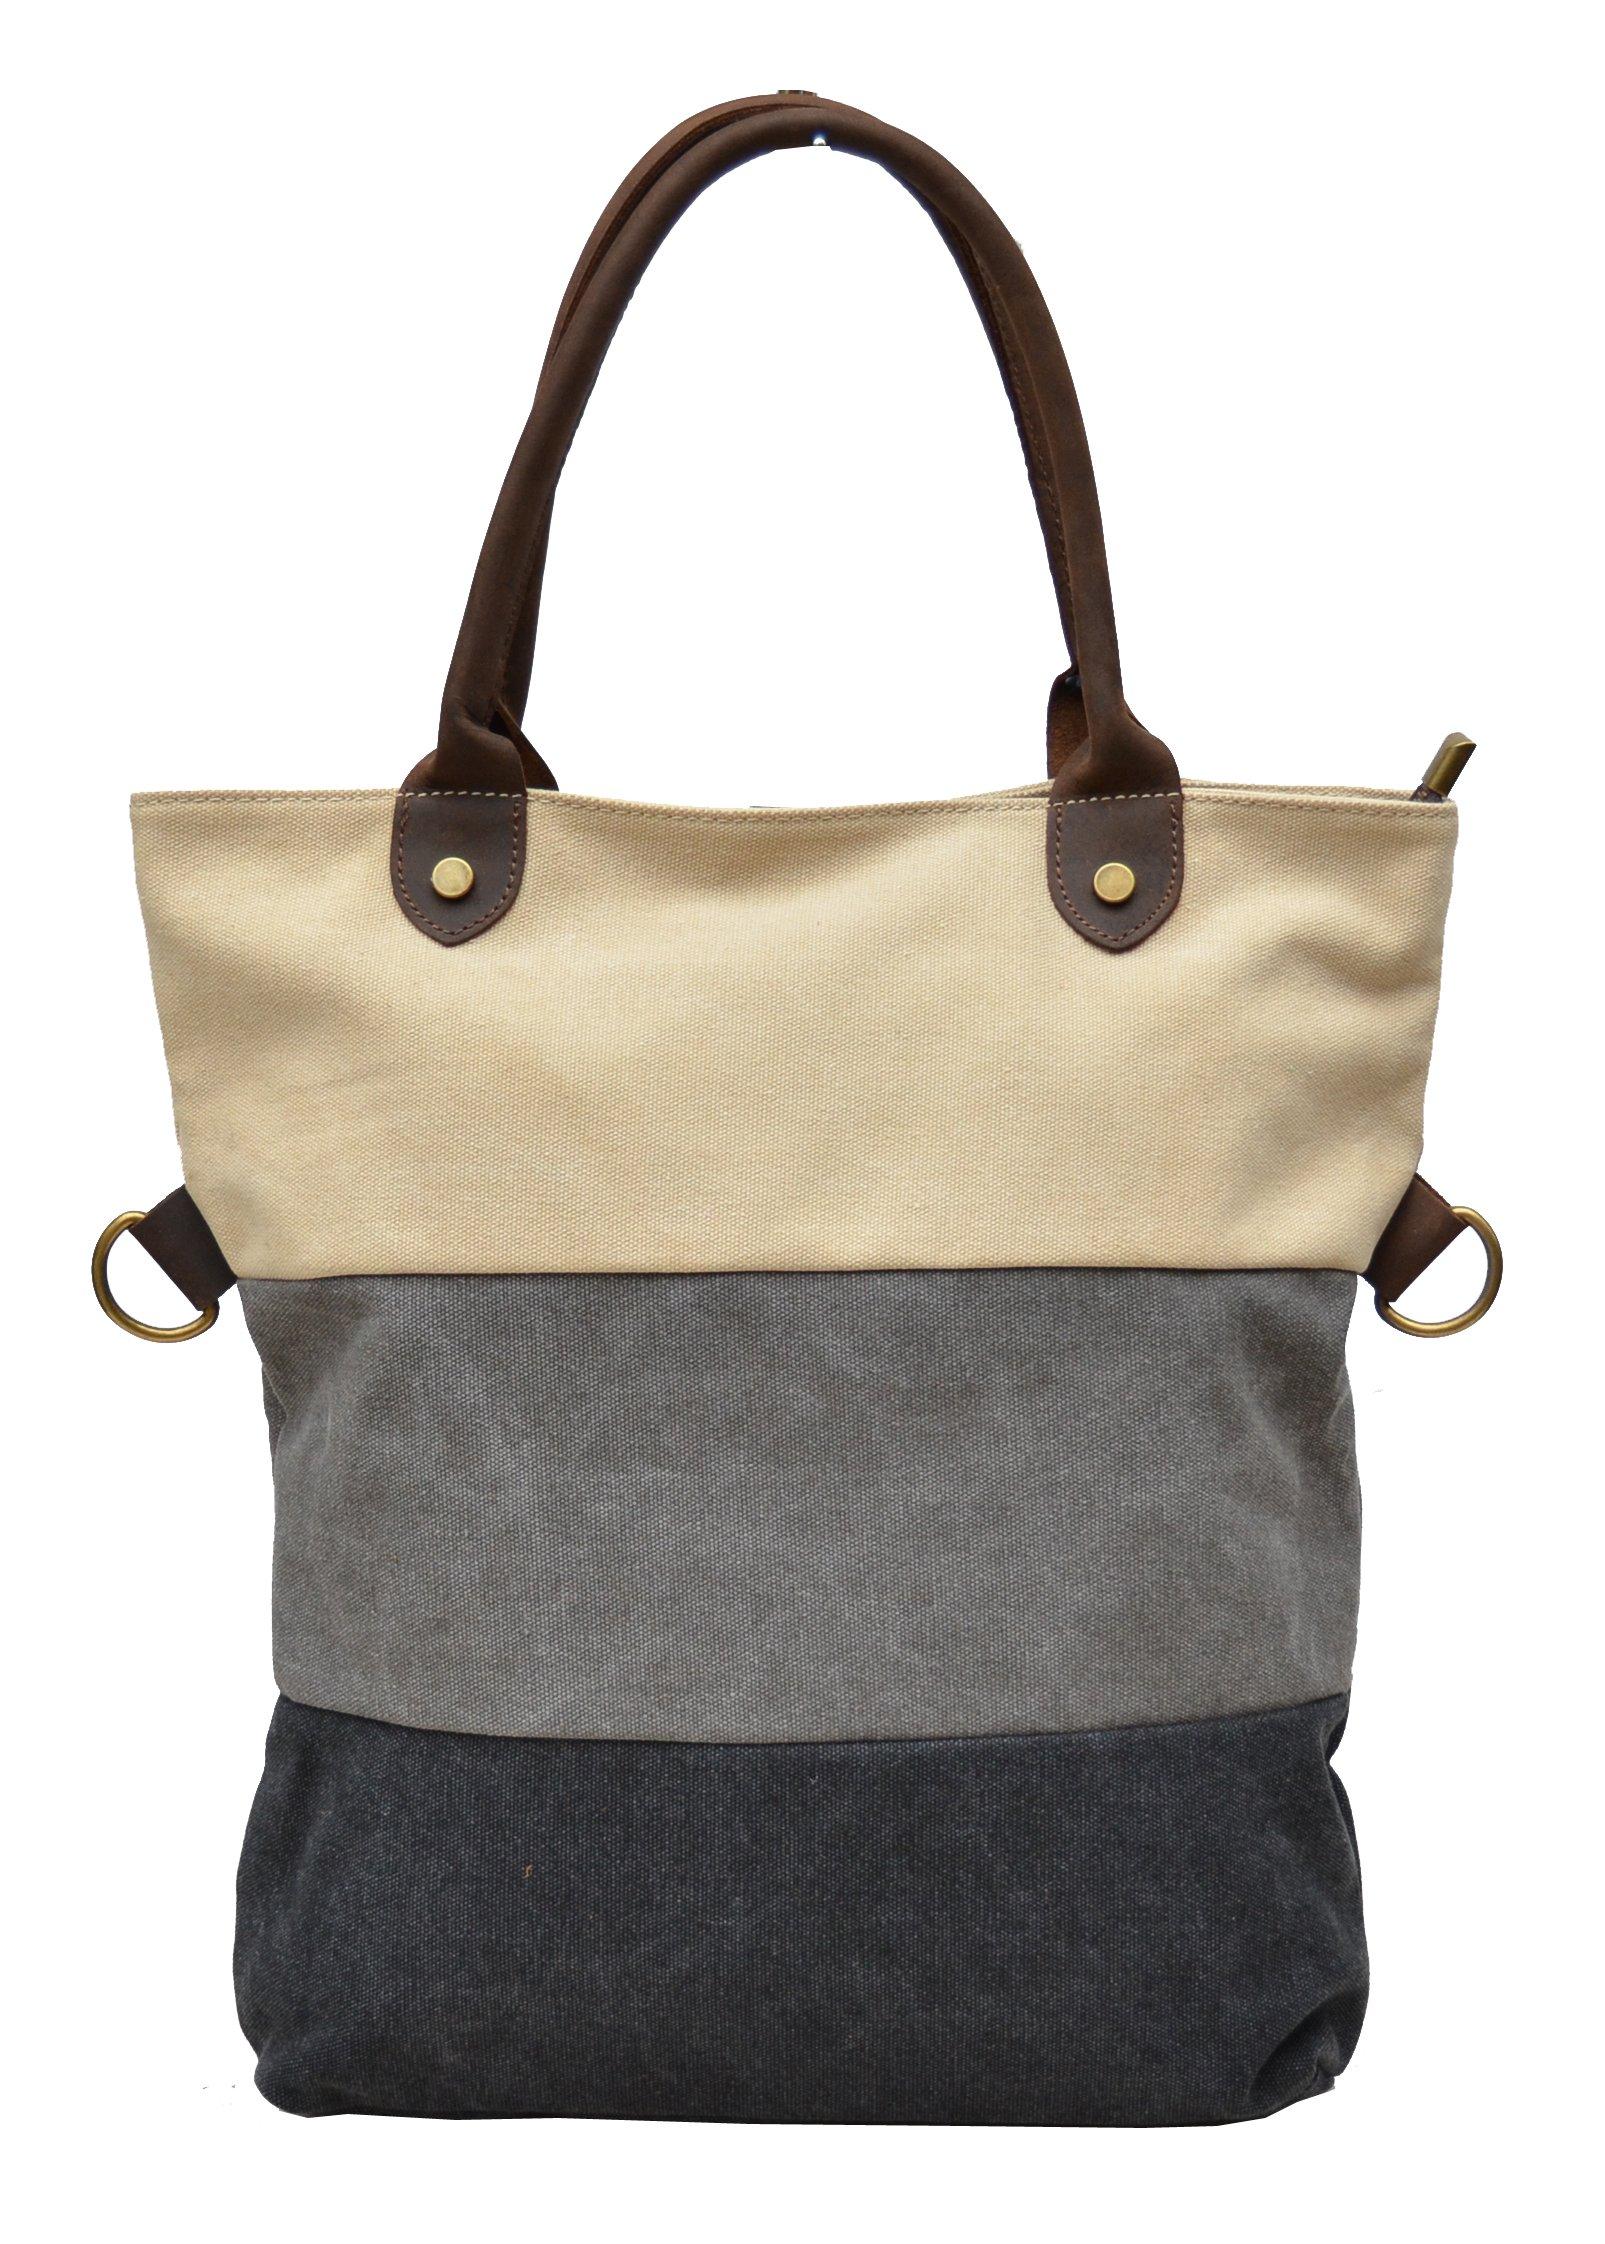 Gootium Canvas Leather Vintage Shoulder Tote Bag, White